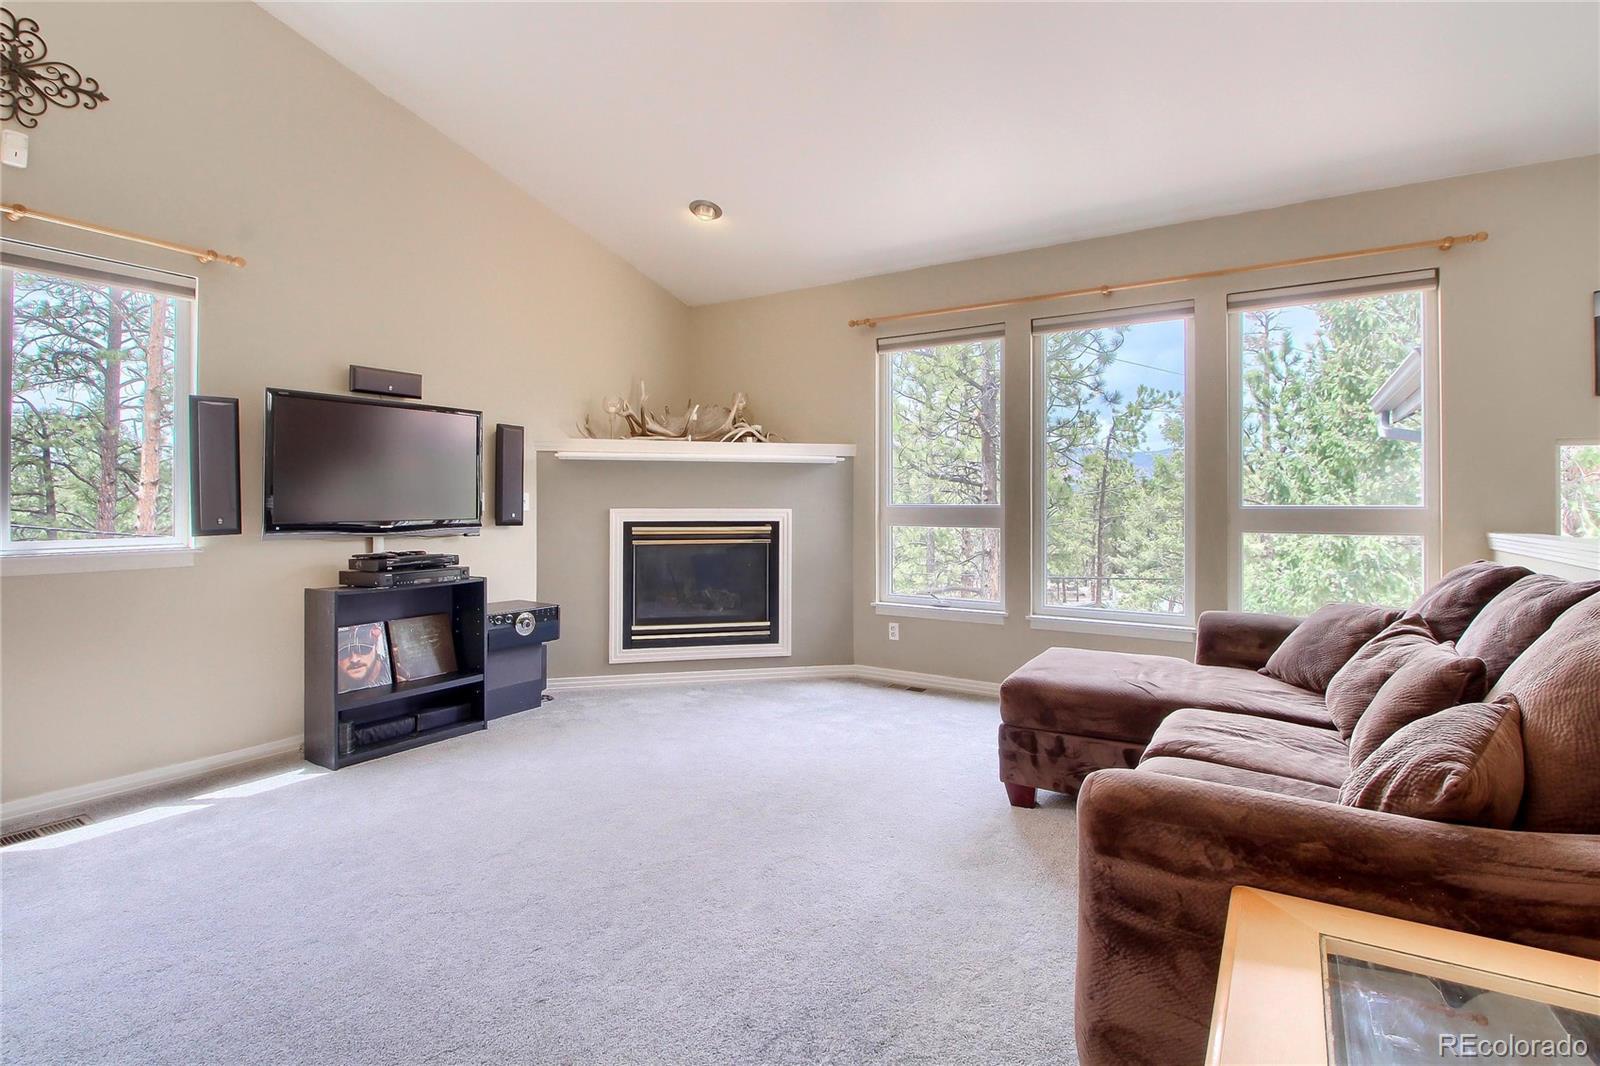 MLS# 7085048 - 9 - 15394 S Wandcrest Drive, Pine, CO 80470